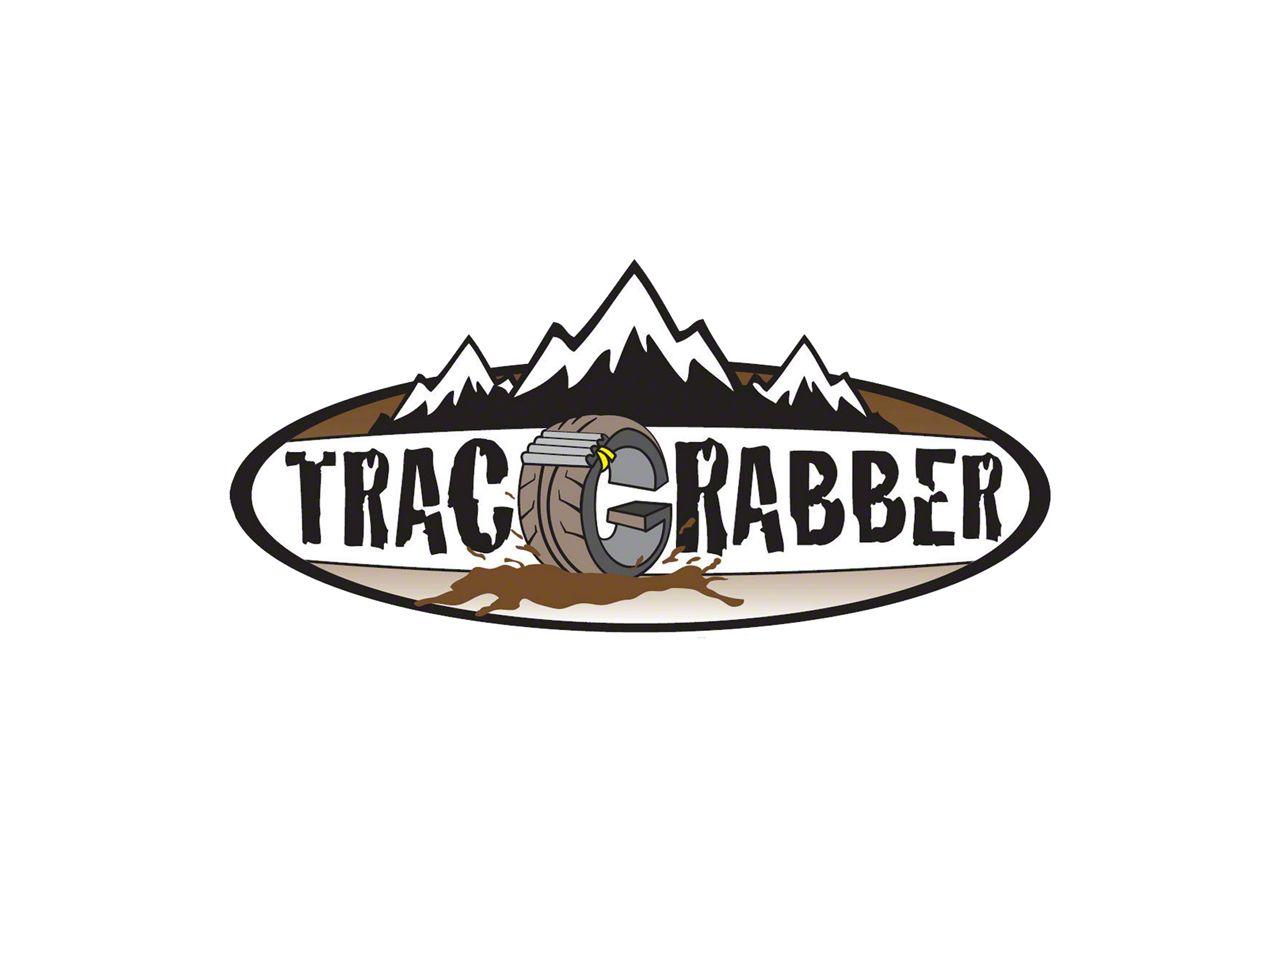 ec84db3cd79 Trac-Grabber Jeep Wrangler Oversized Tire Traction Mounts - Pair TG ...